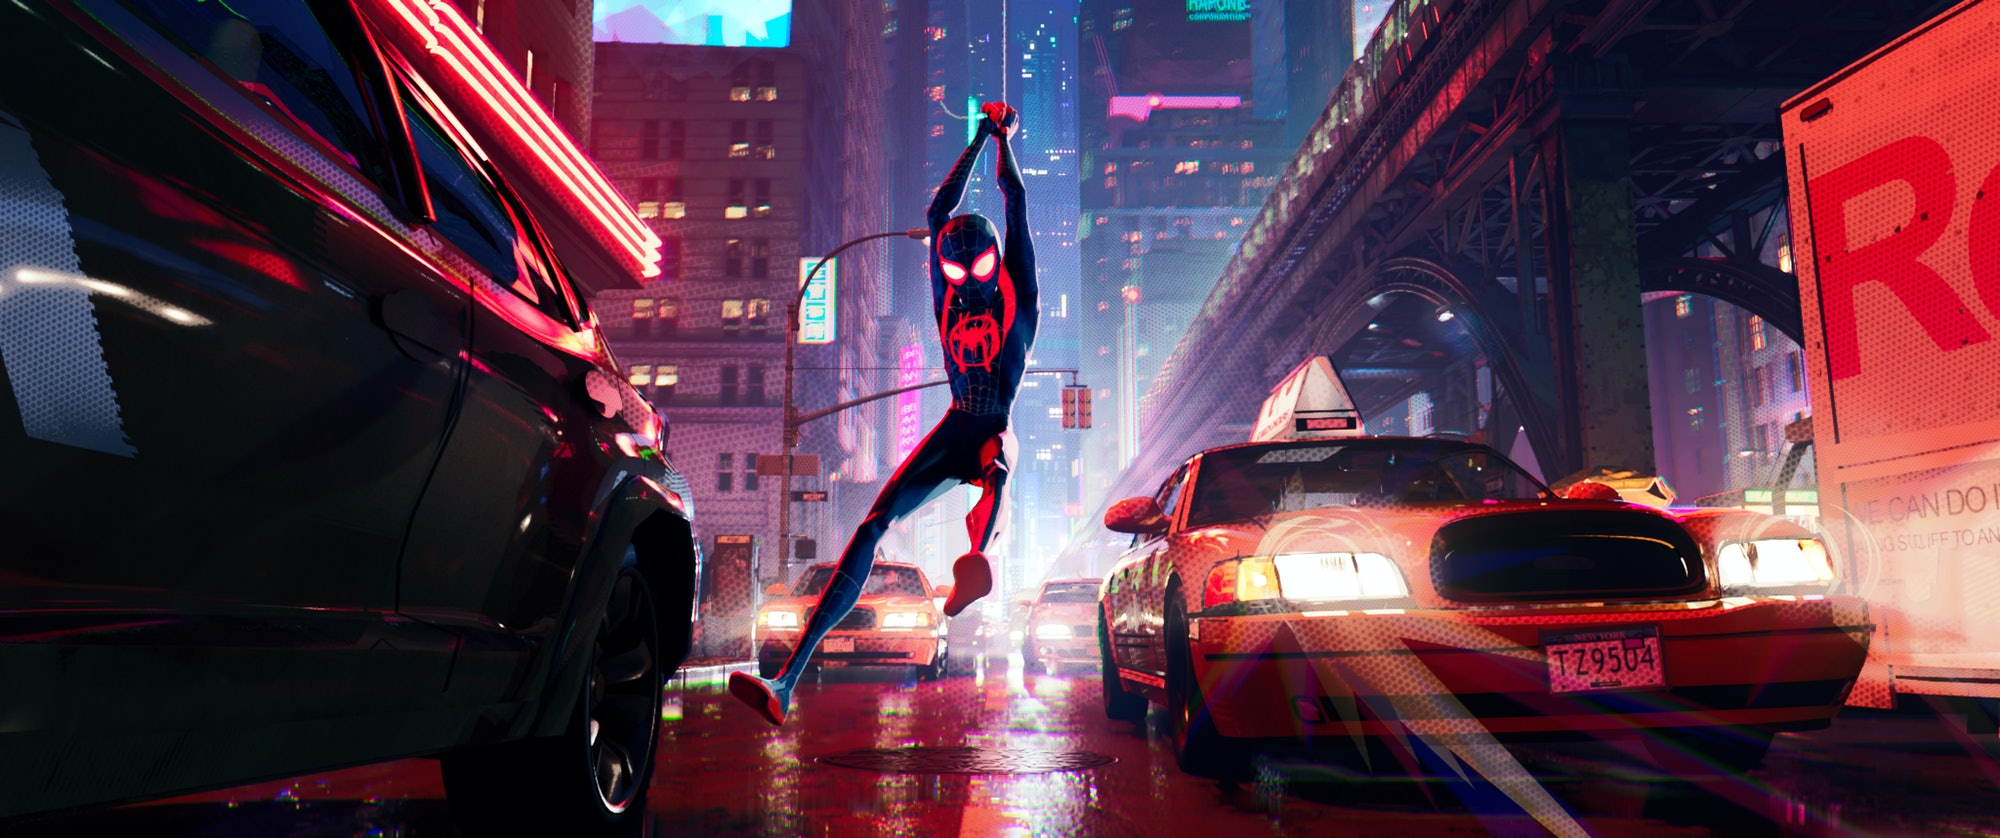 Spider-Man Into the Spider-Verse Oscars